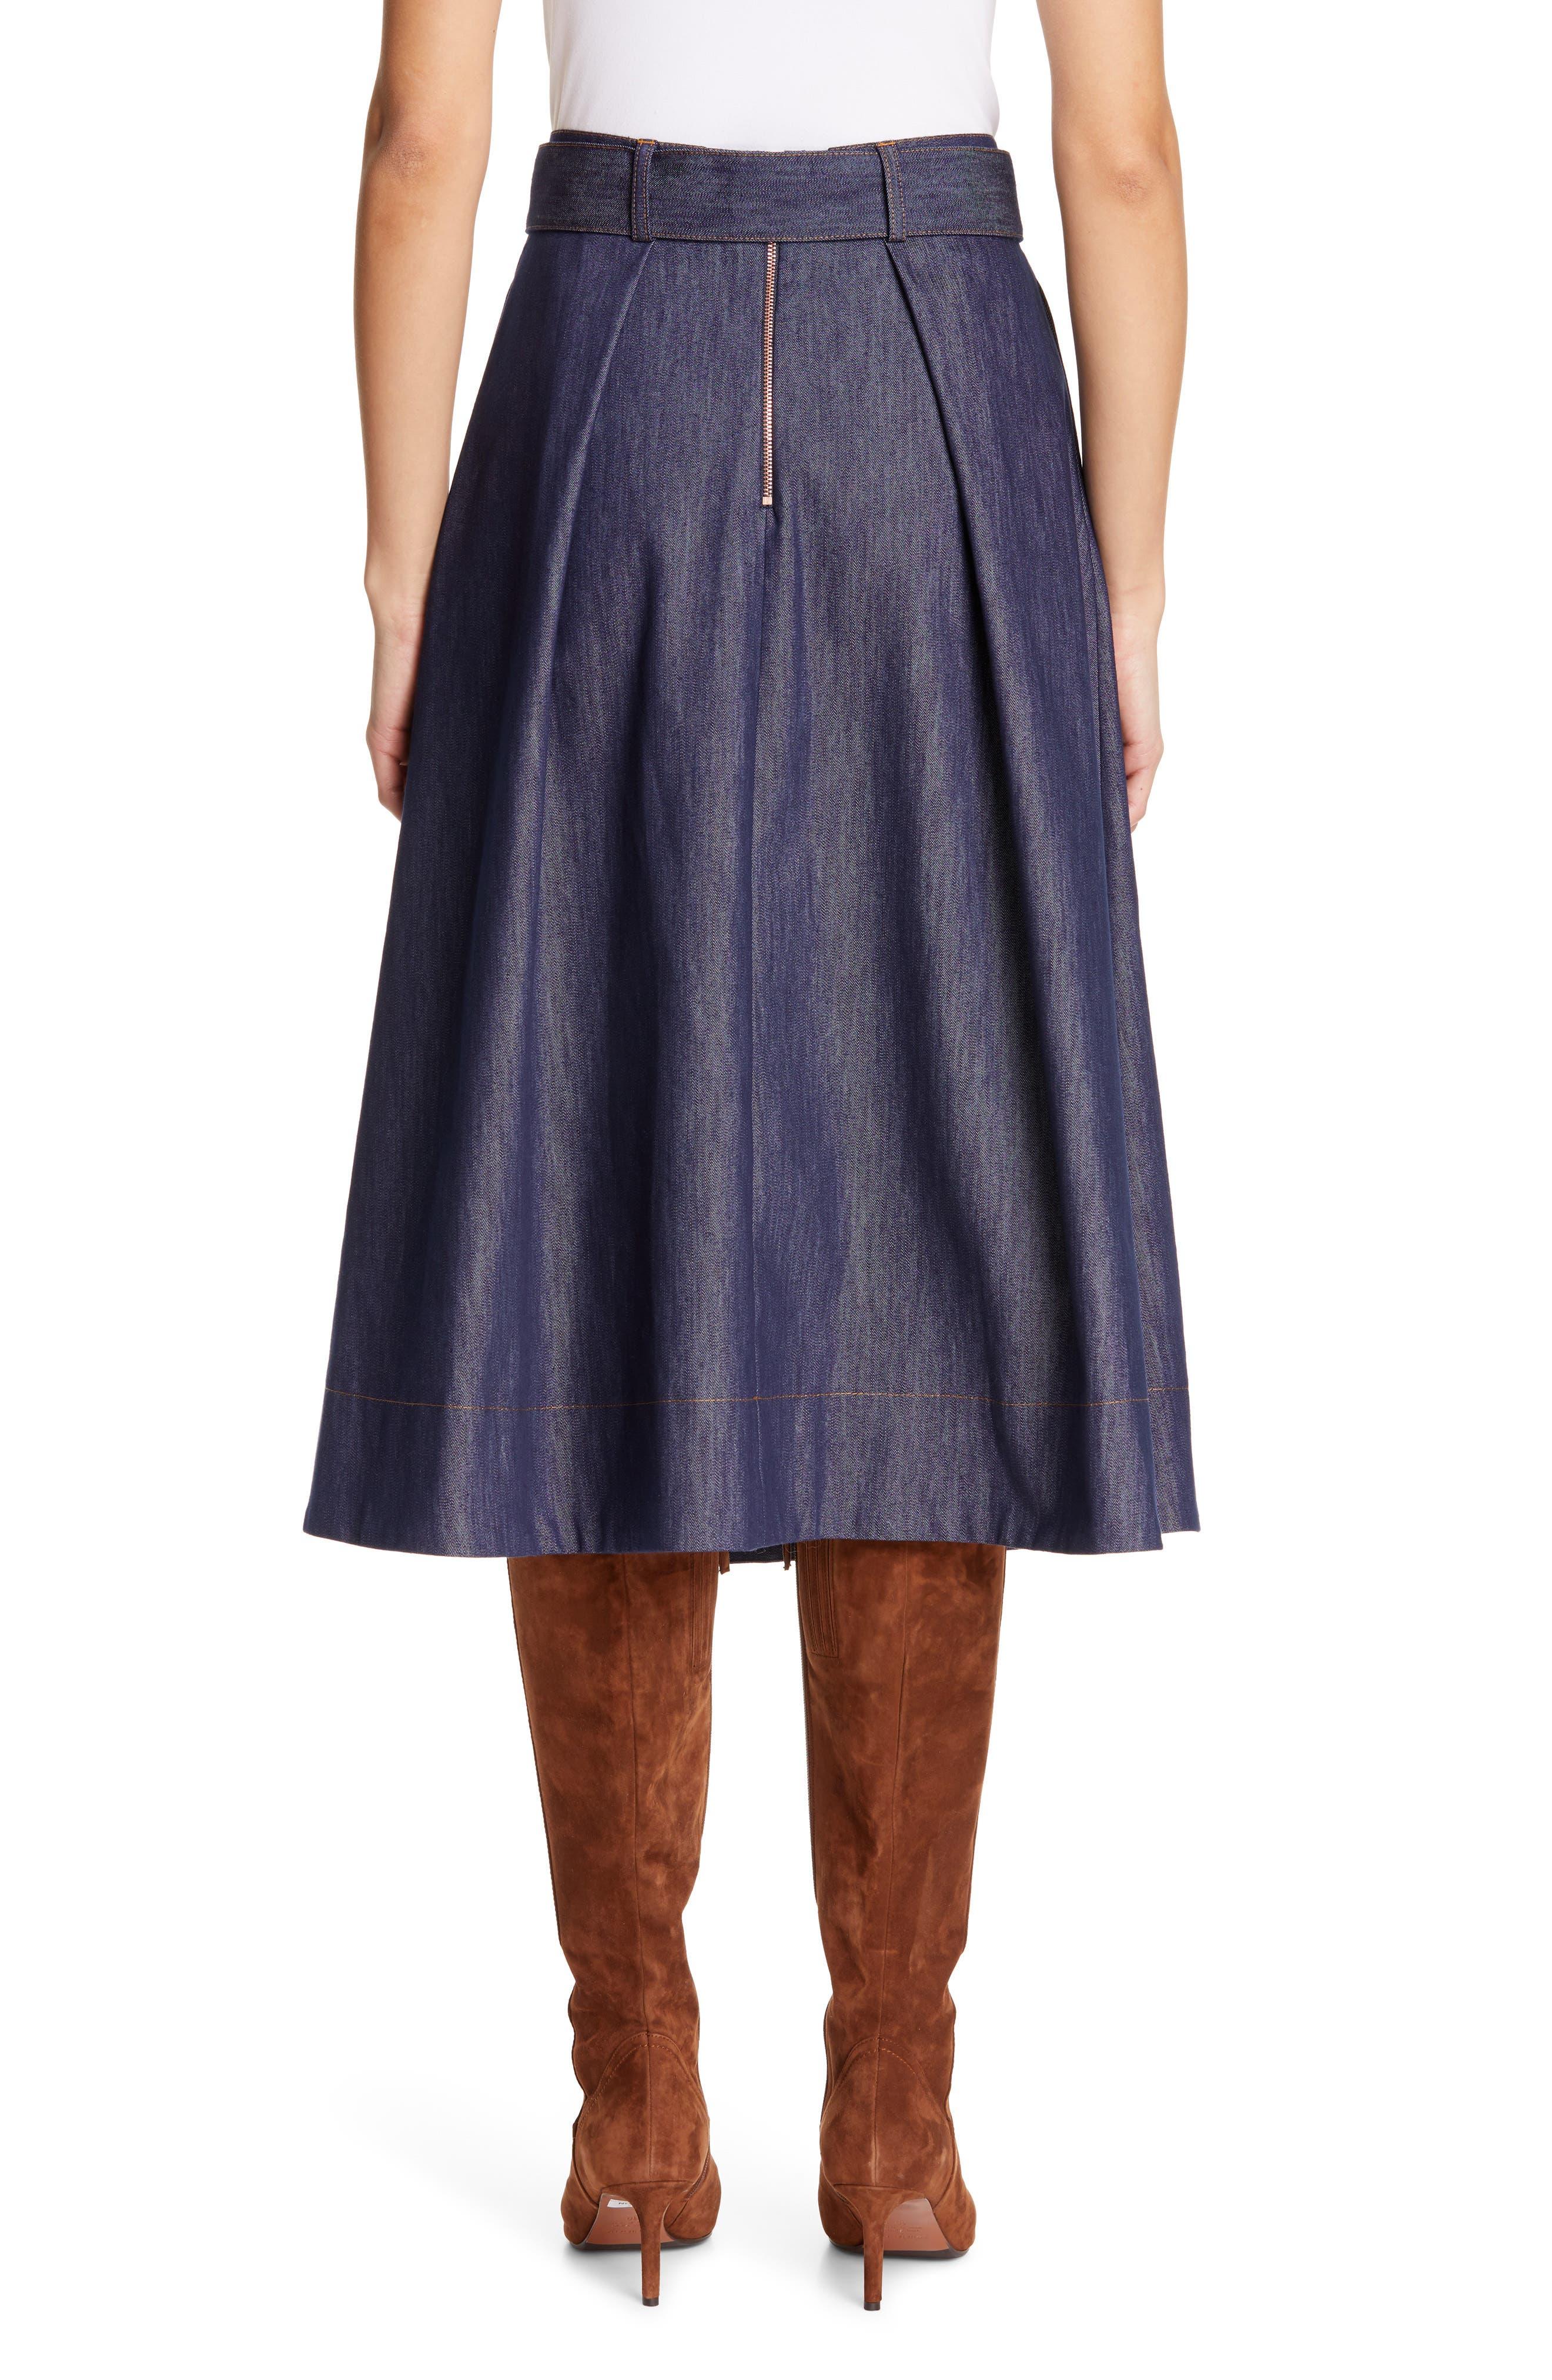 TOMMY X ZENDAYA, Belted Denim Skirt, Alternate thumbnail 2, color, 402